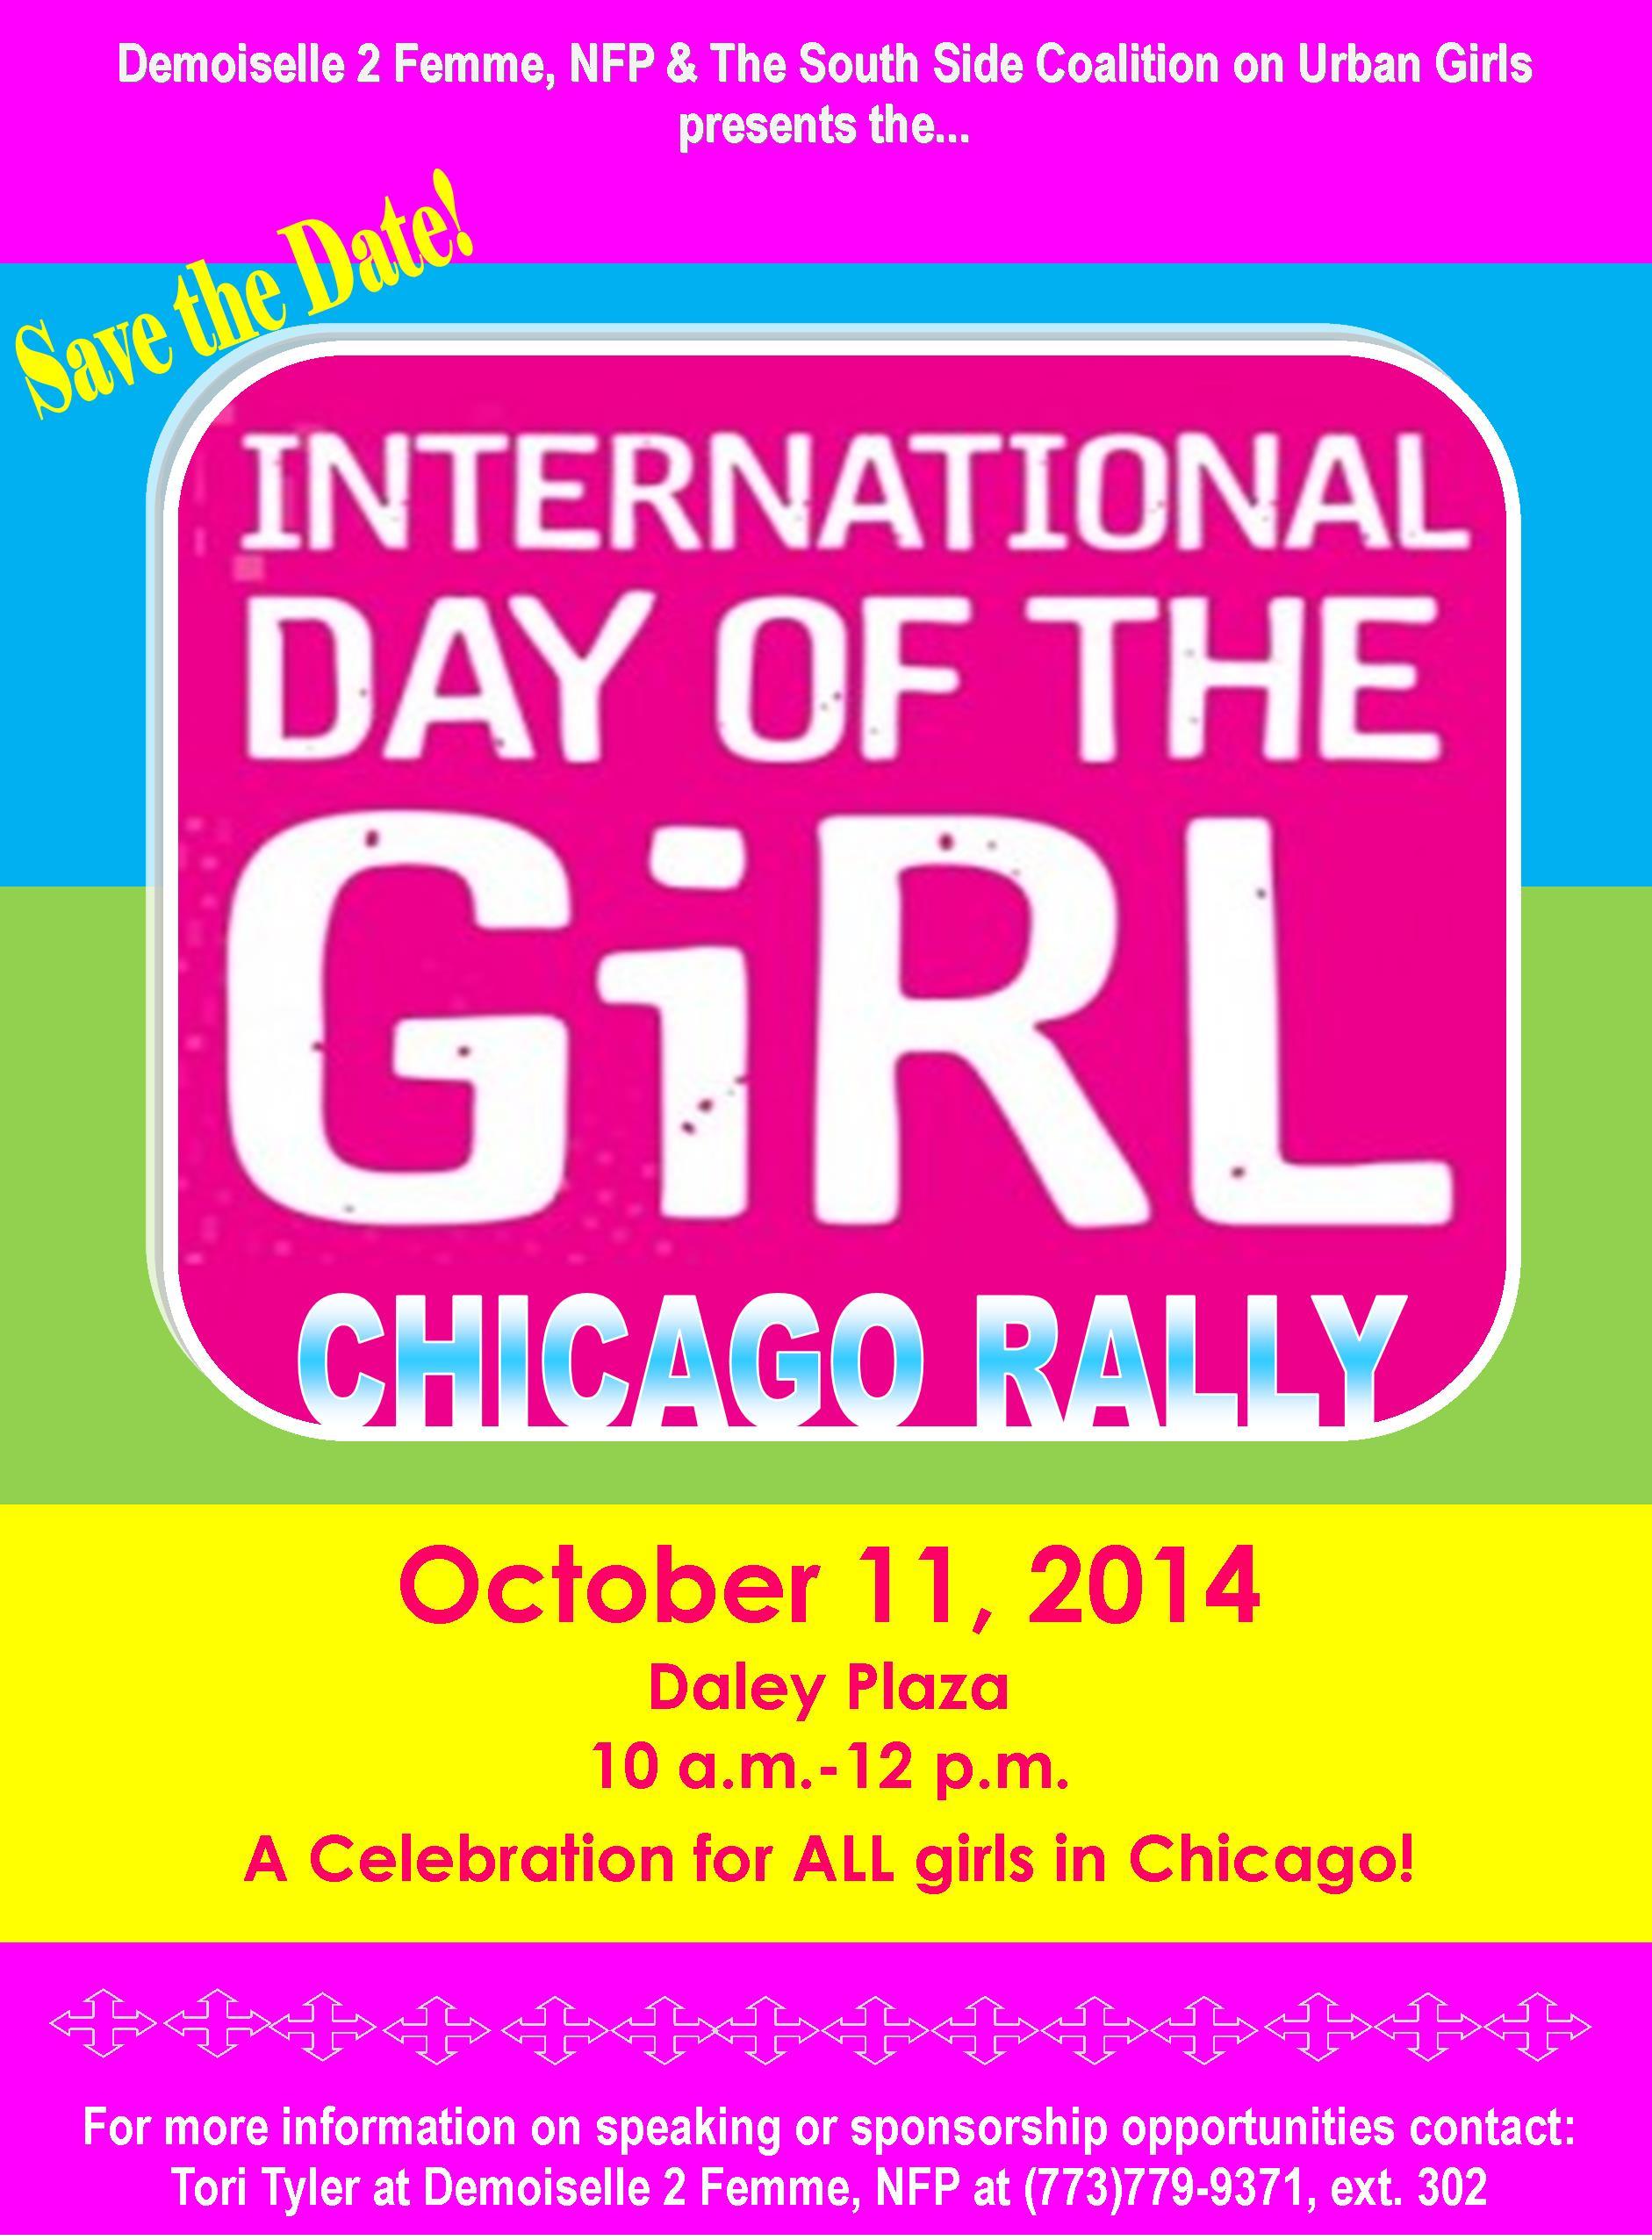 IDOTG Rally Save the Date